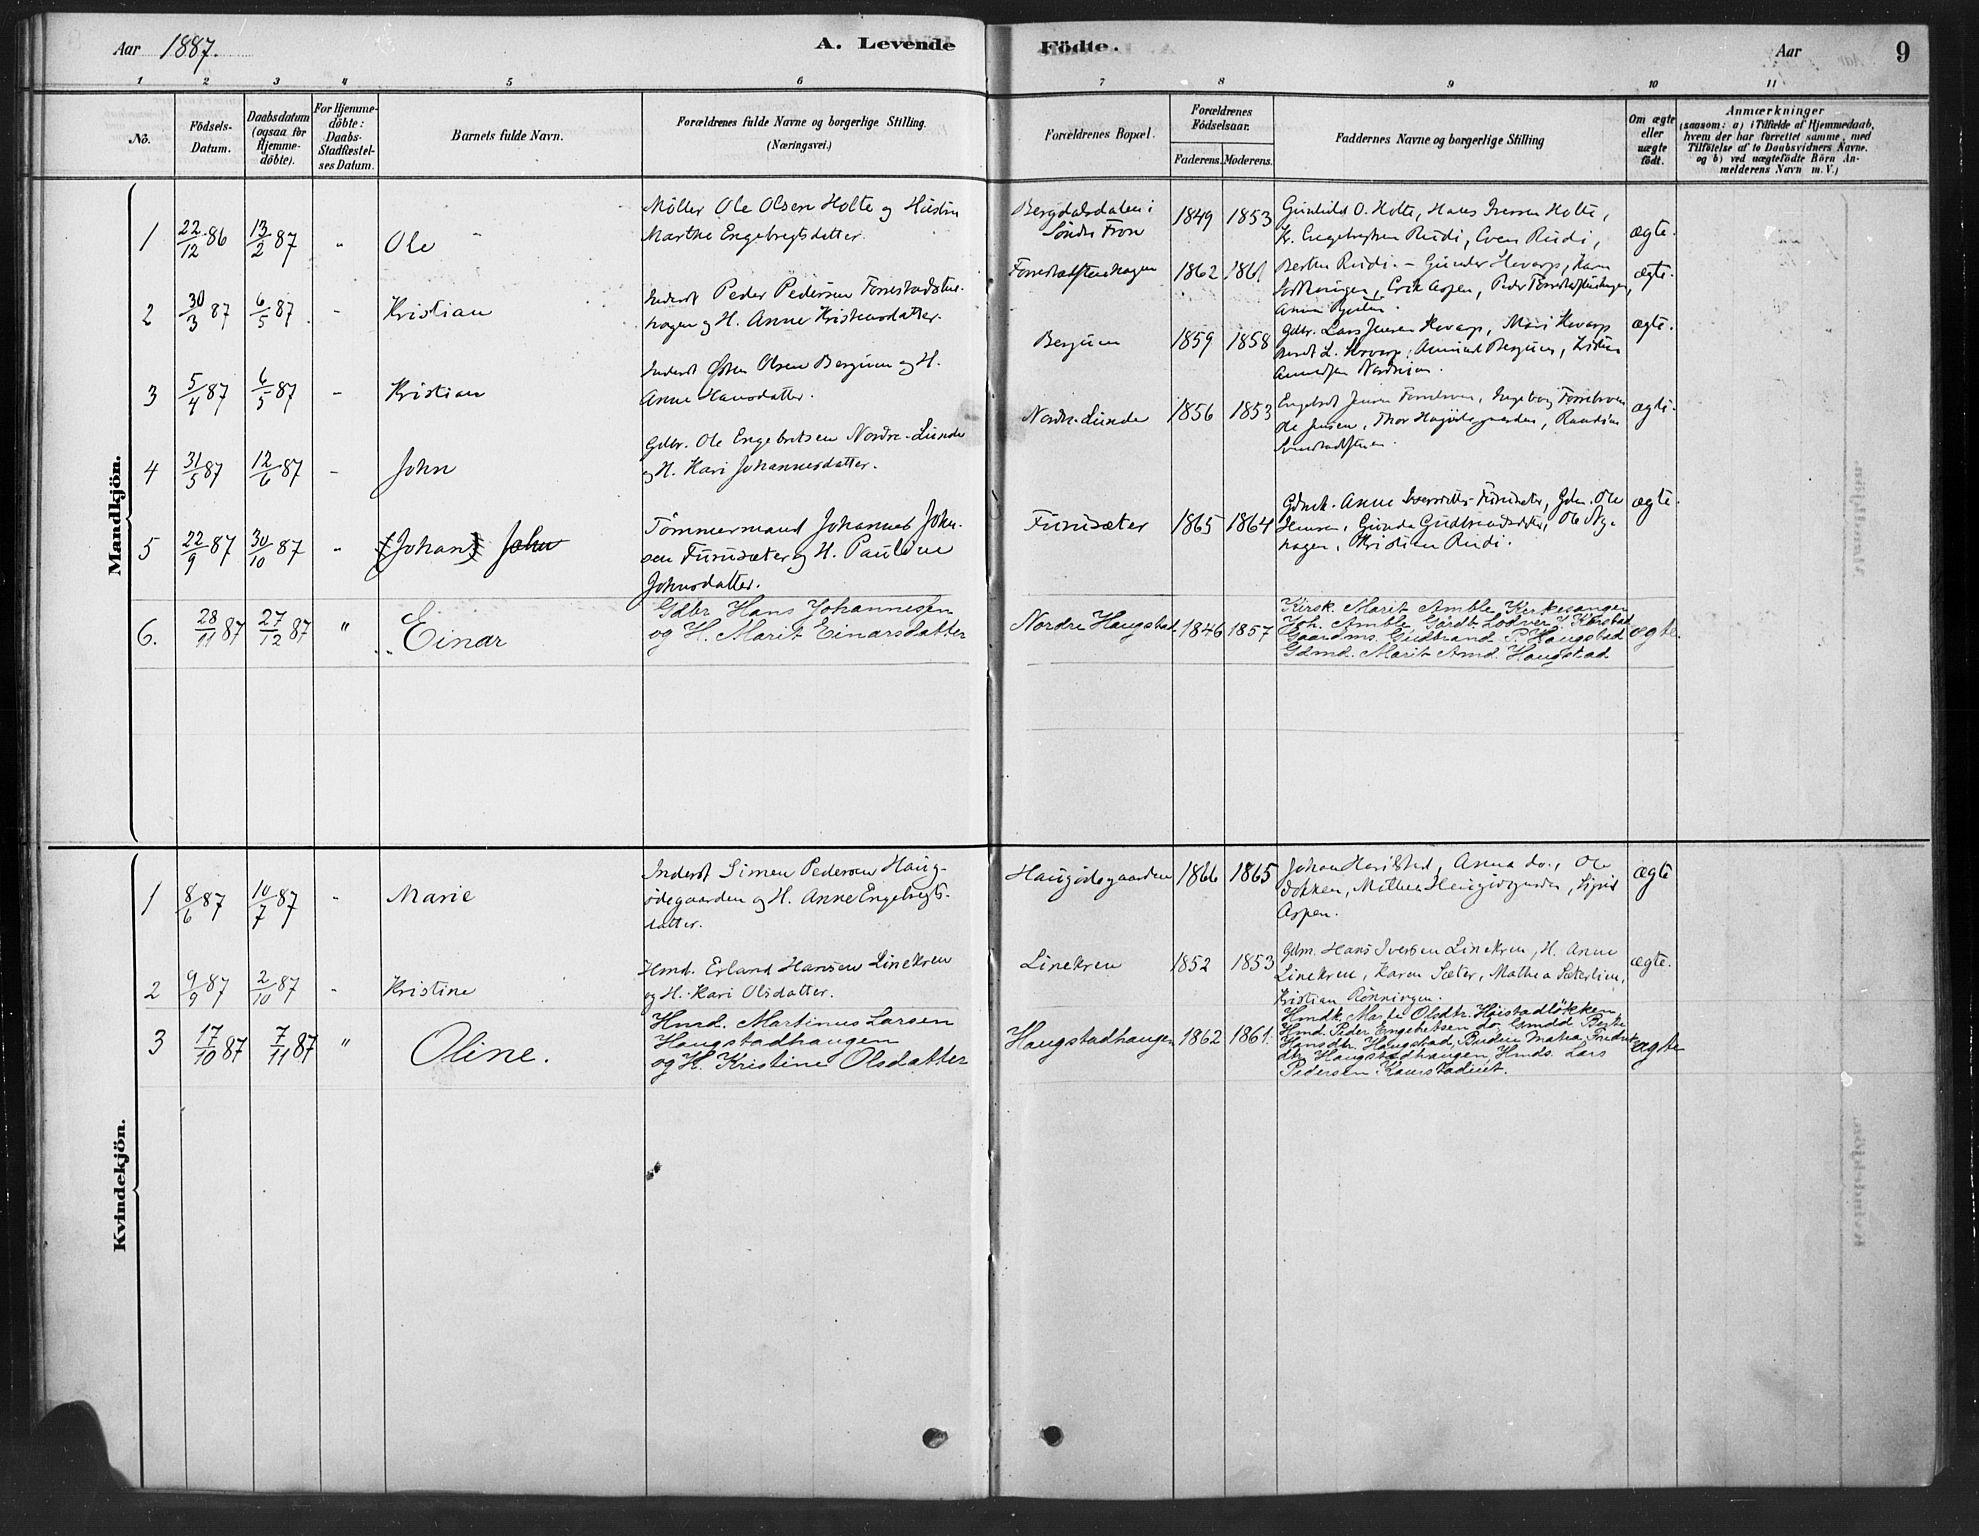 SAH, Ringebu prestekontor, Ministerialbok nr. 10, 1878-1898, s. 9